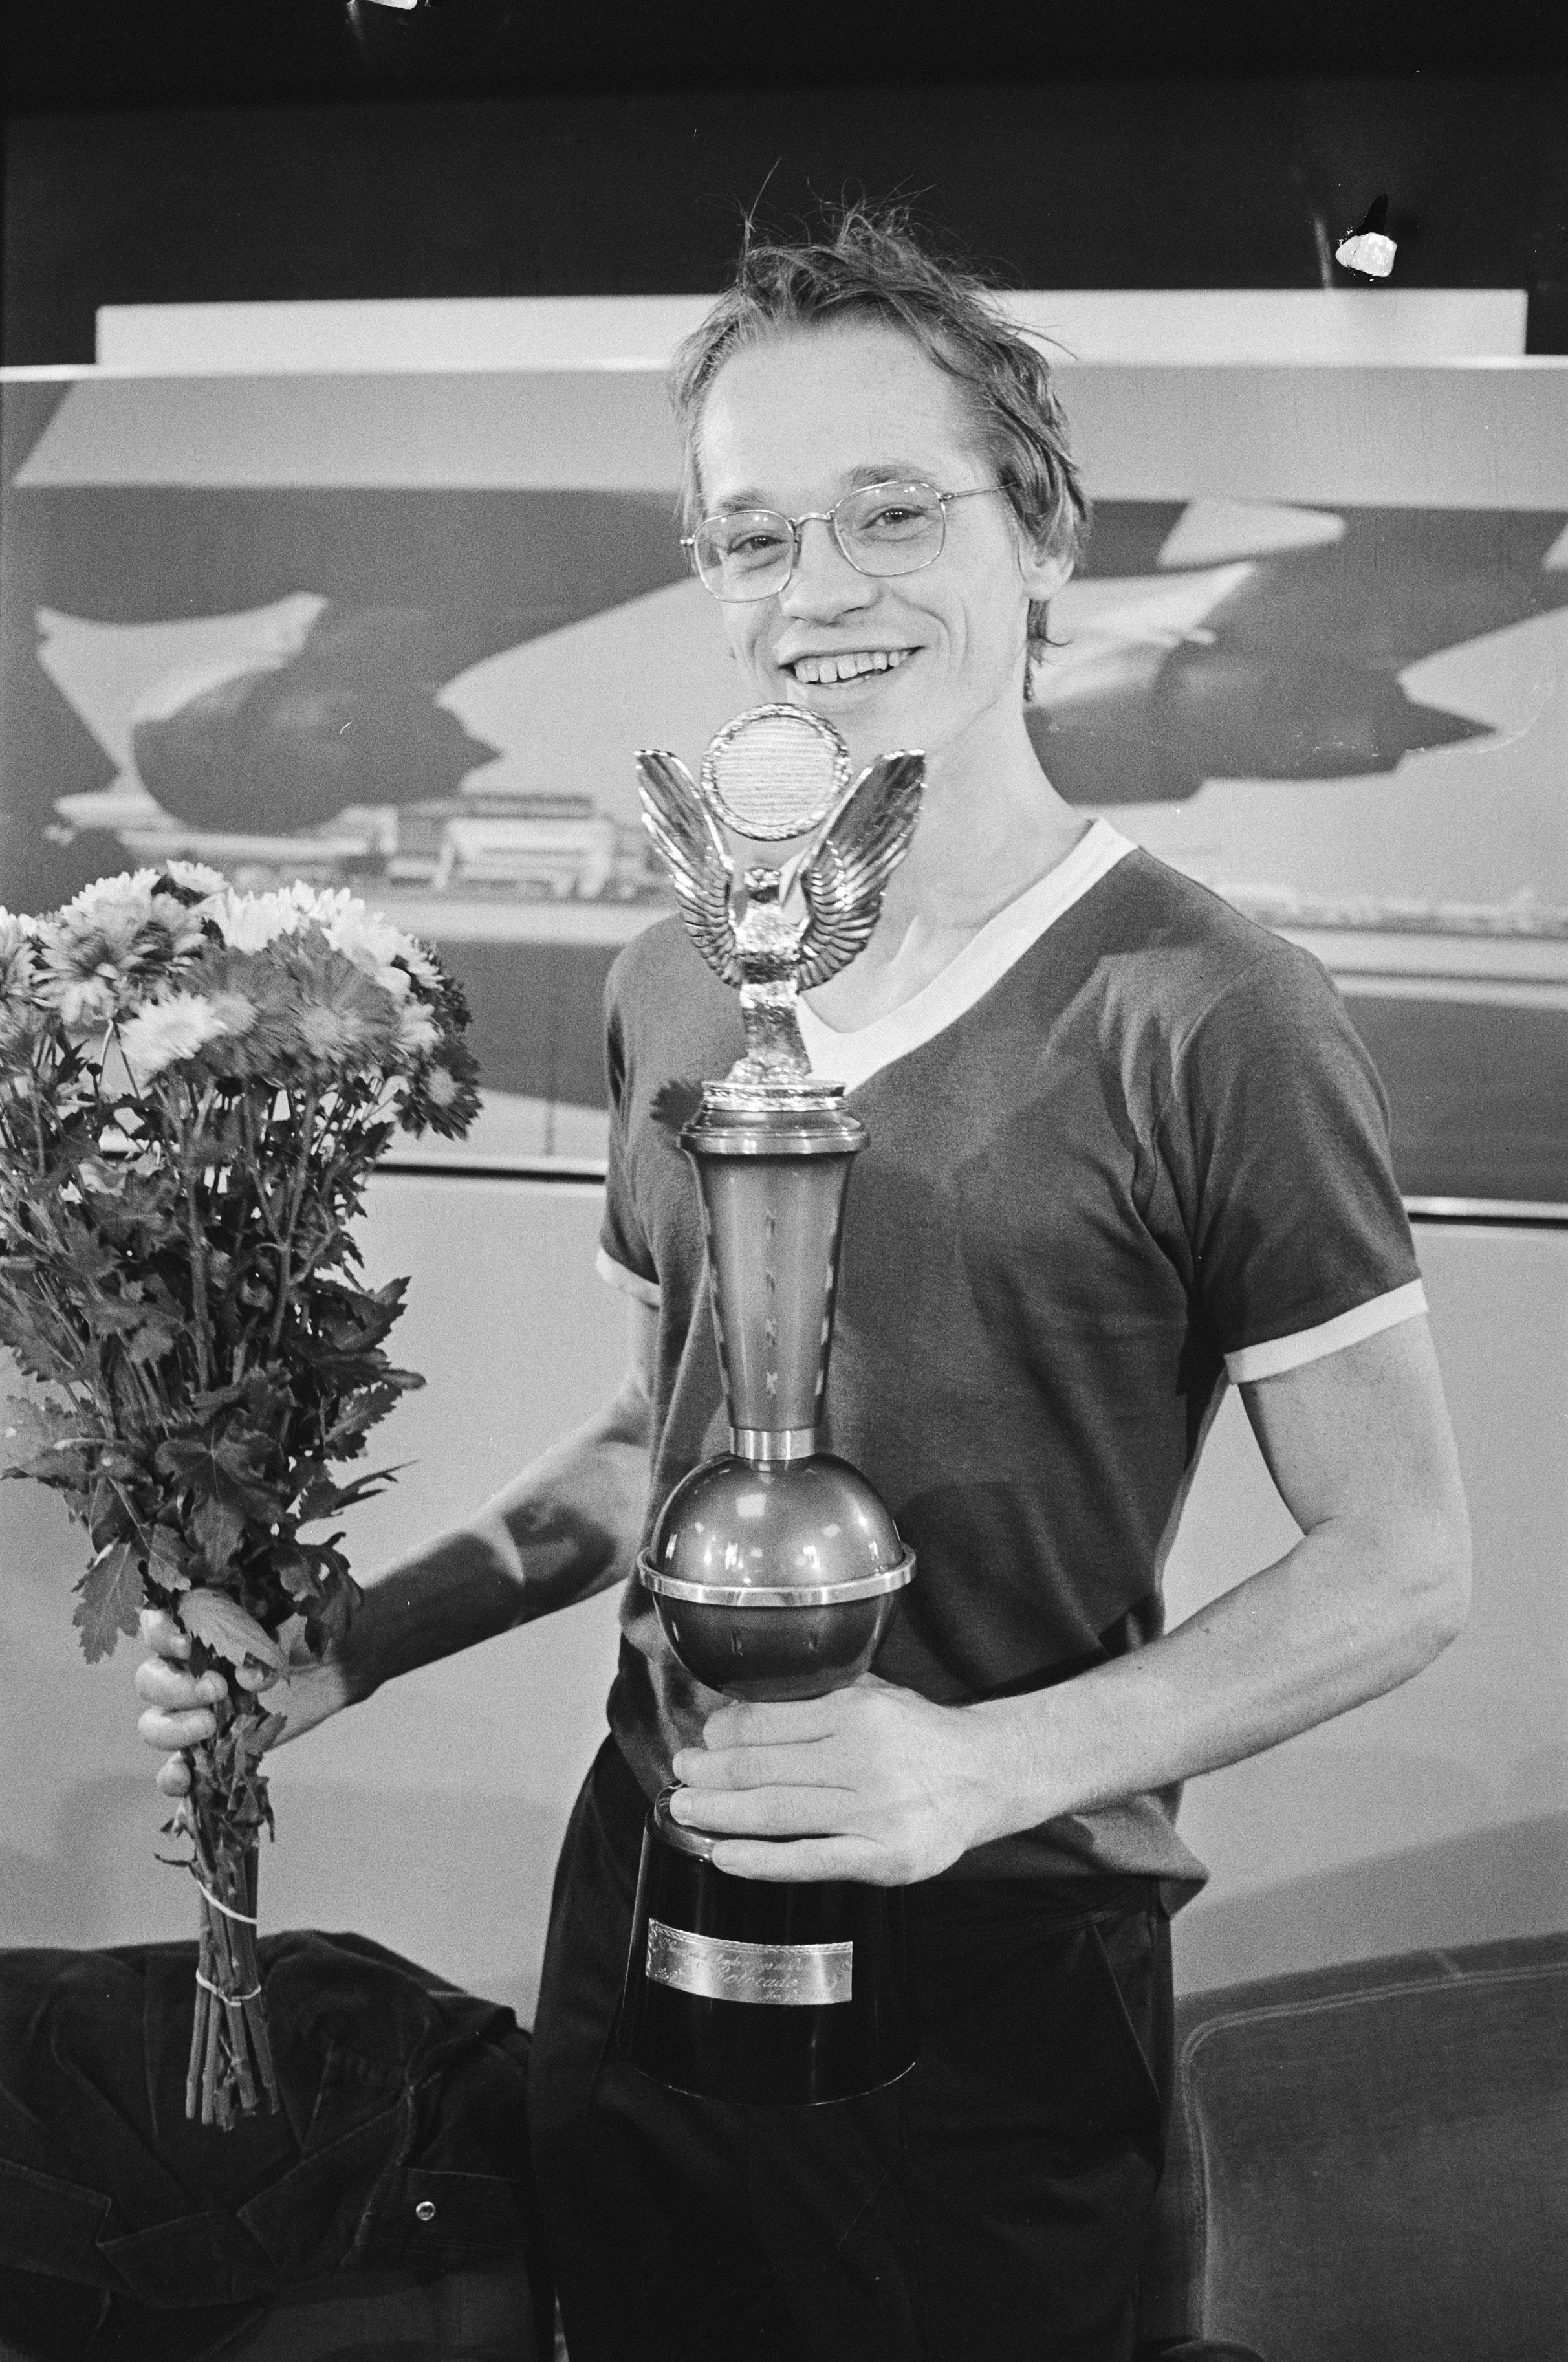 Jannes van der Wal was de beste dammer ter wereld en begreep niet waarom Mies Bouwman hem vroeg hoe oud hij was [video]